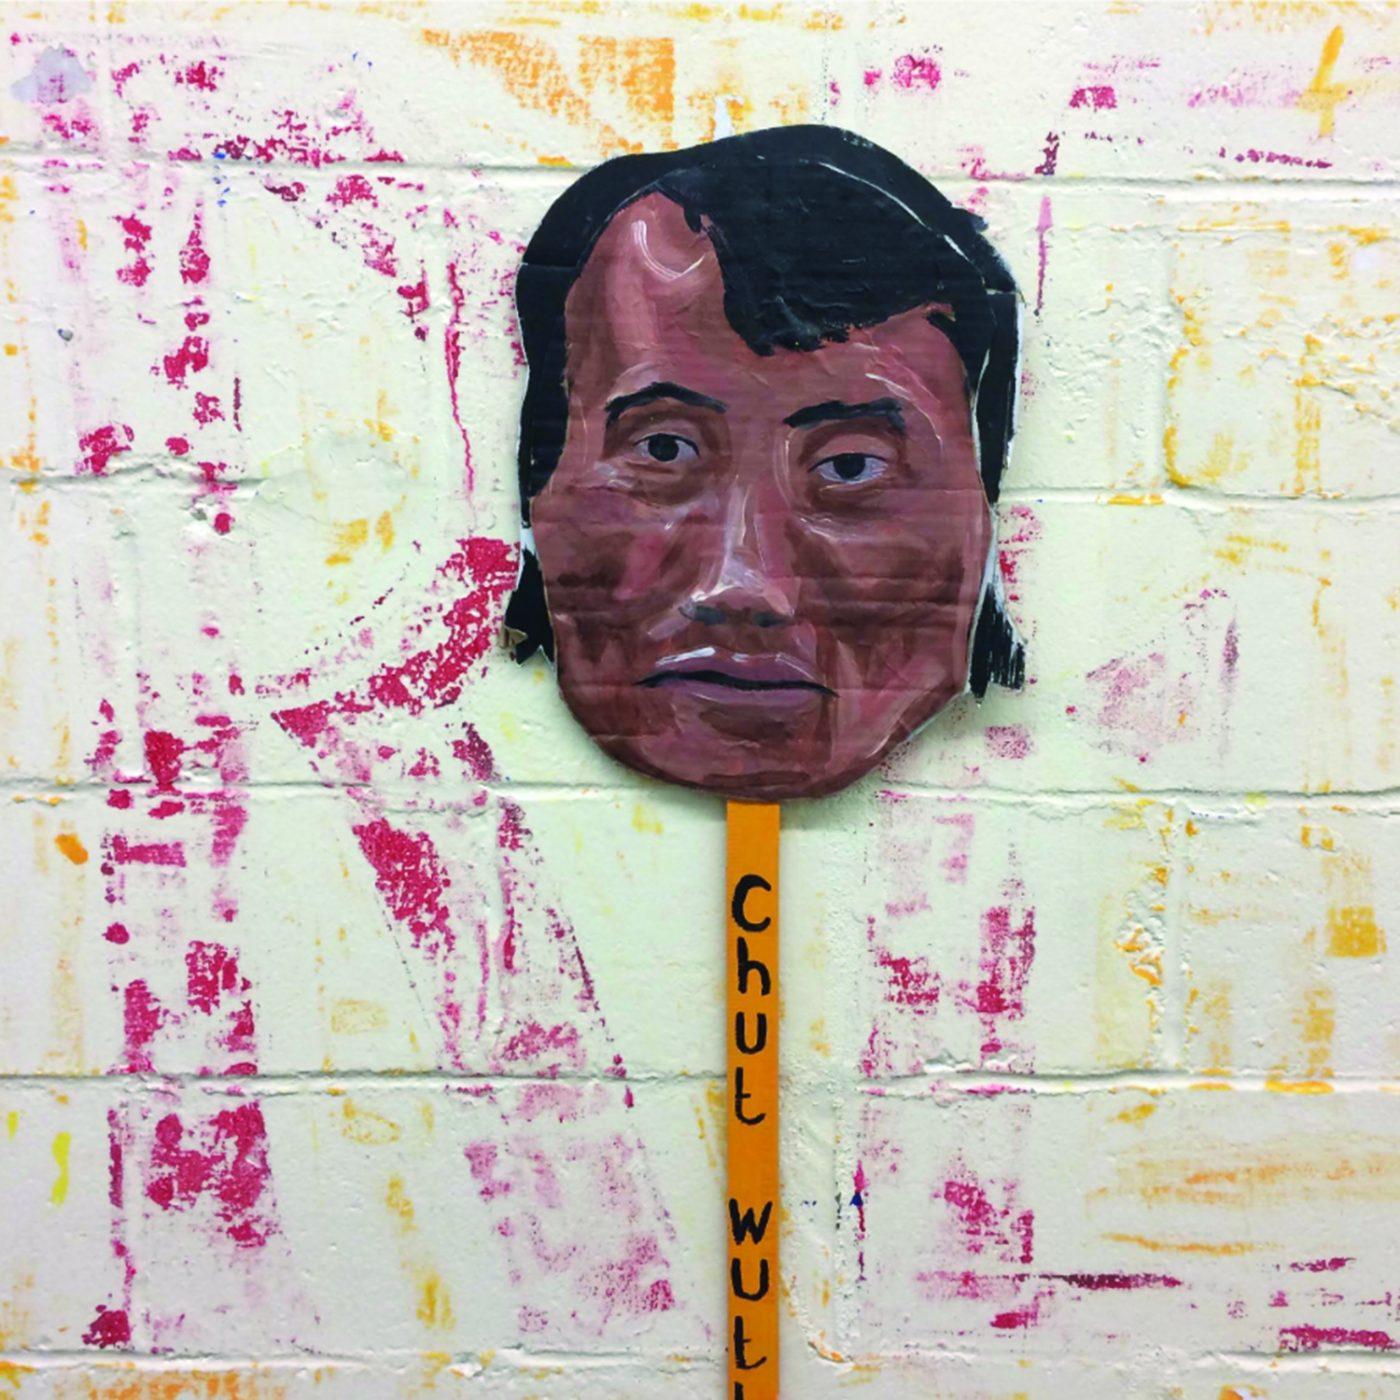 Cardboard rendering of Chut Wutty